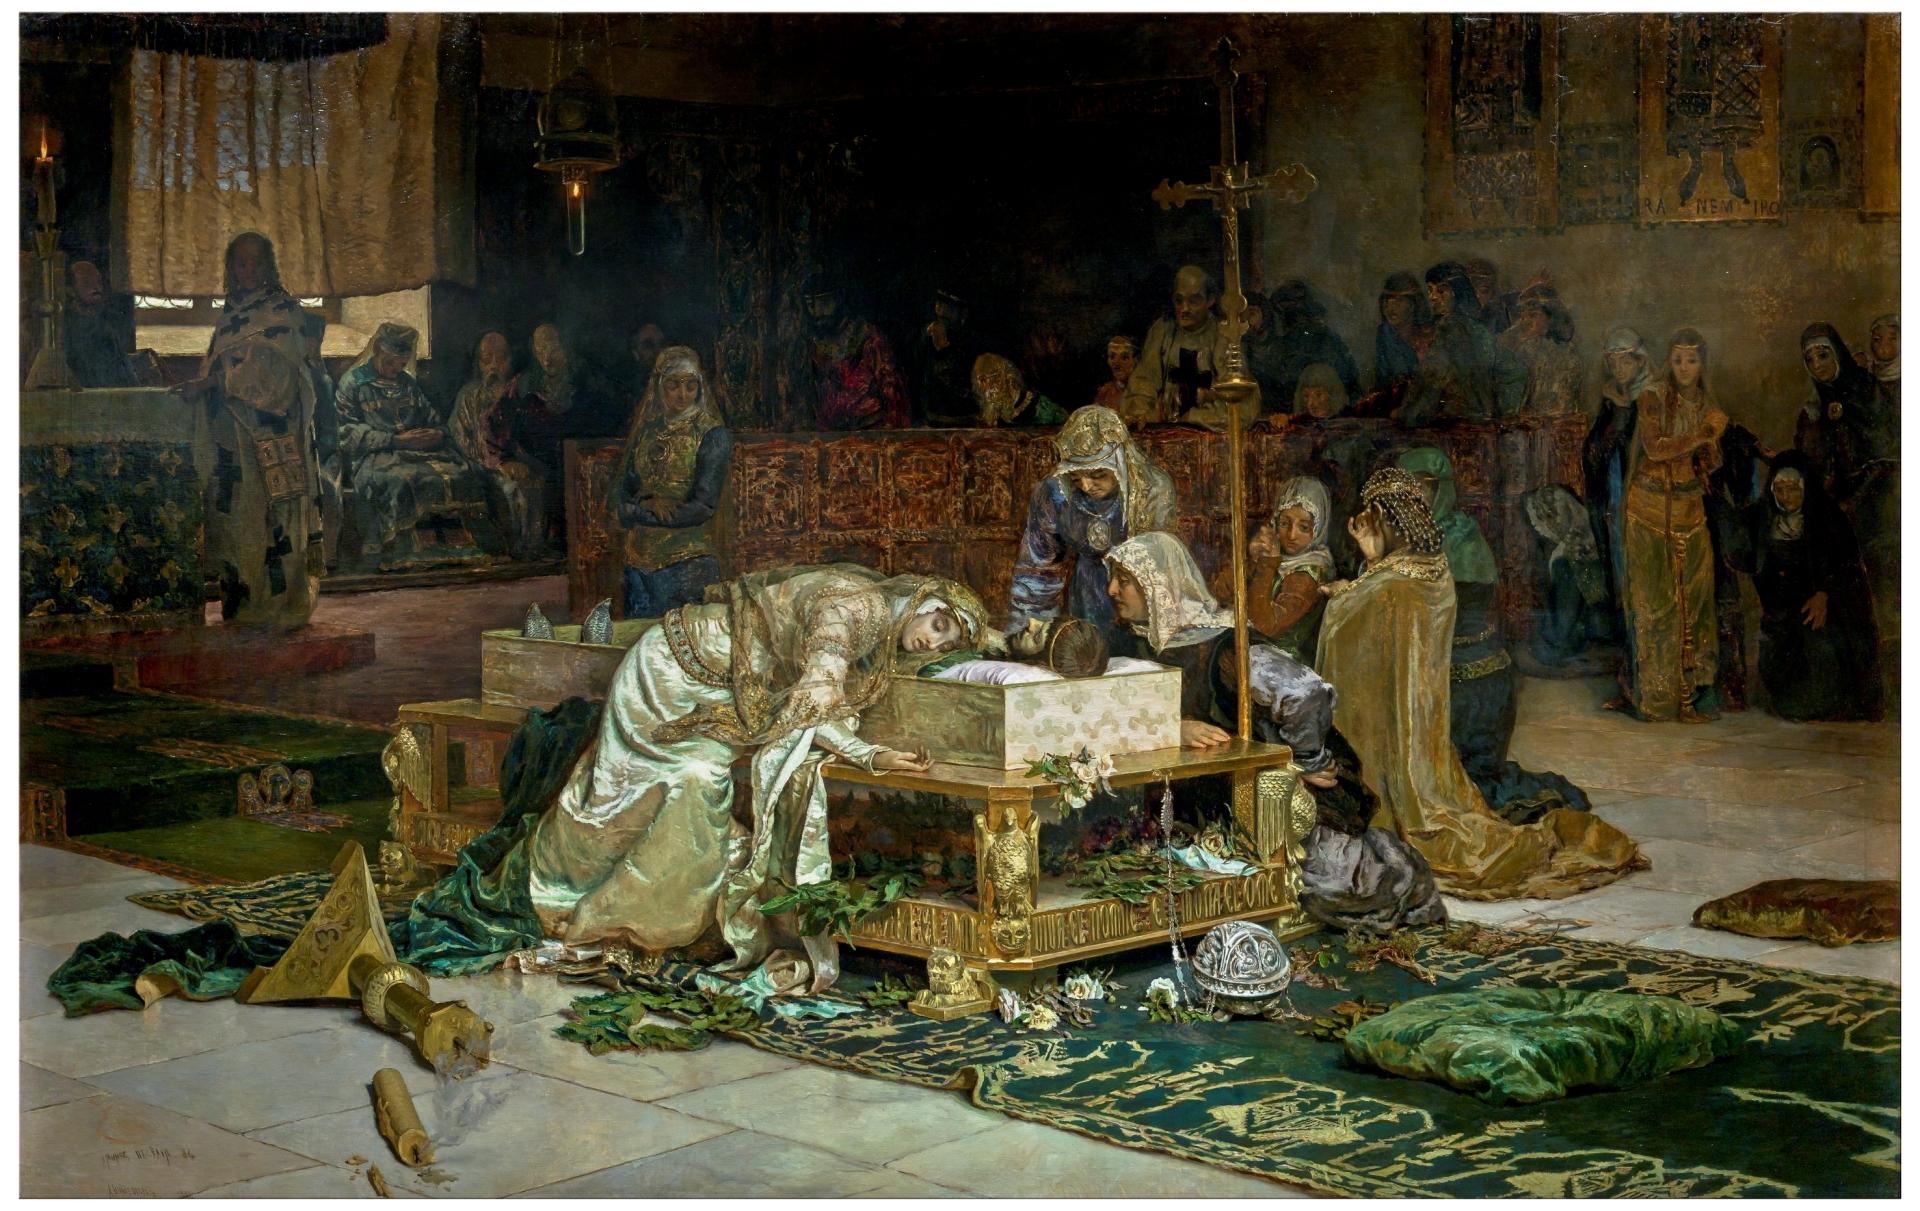 The Lovers of Teruel - The Collection - Museo Nacional del Prado